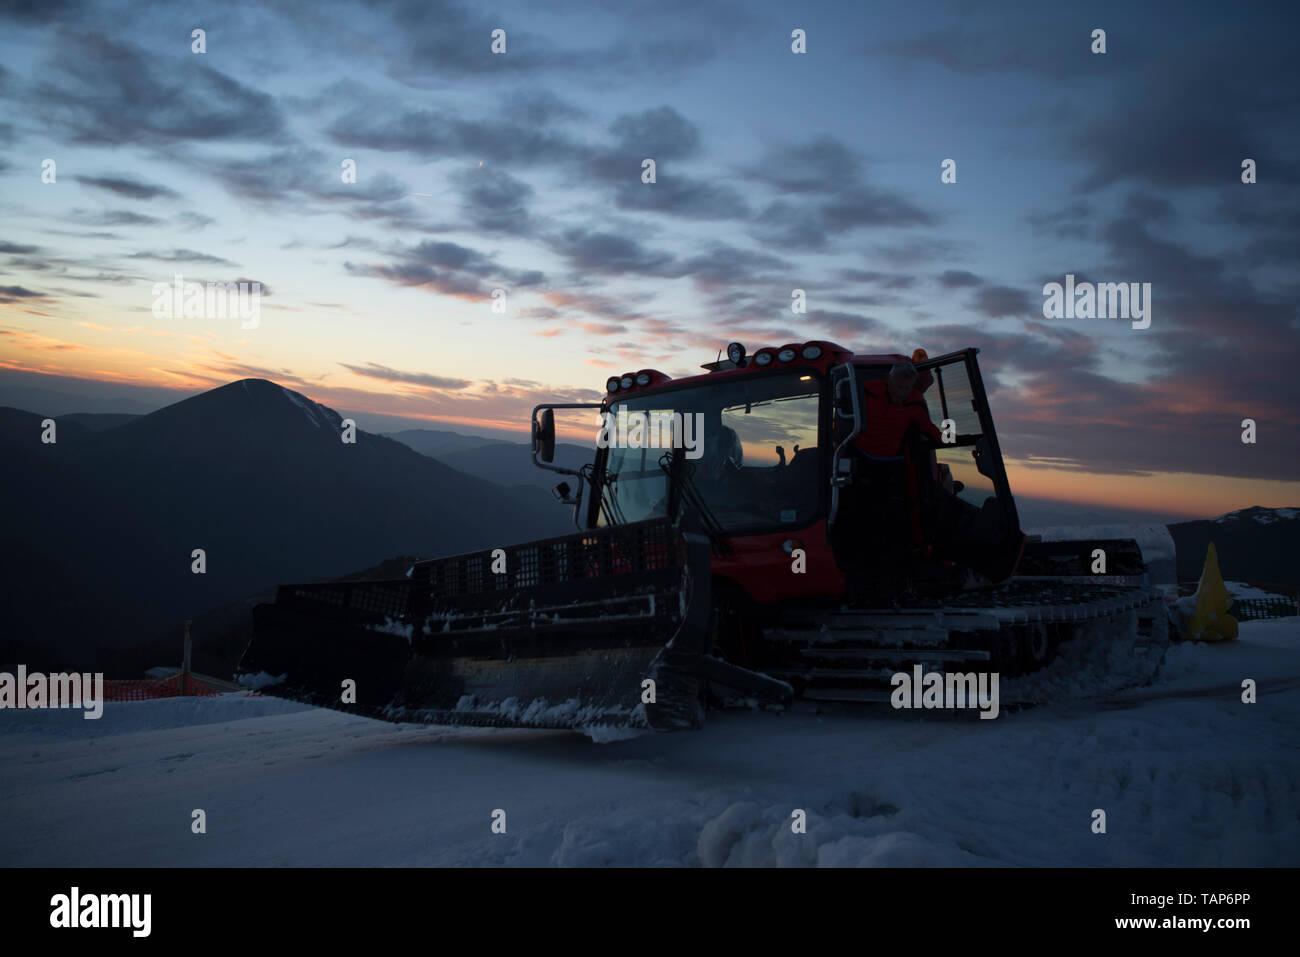 snowmobile at dusk,Prata Mountain,Sibillini National Park,Marche,Italy - Stock Image